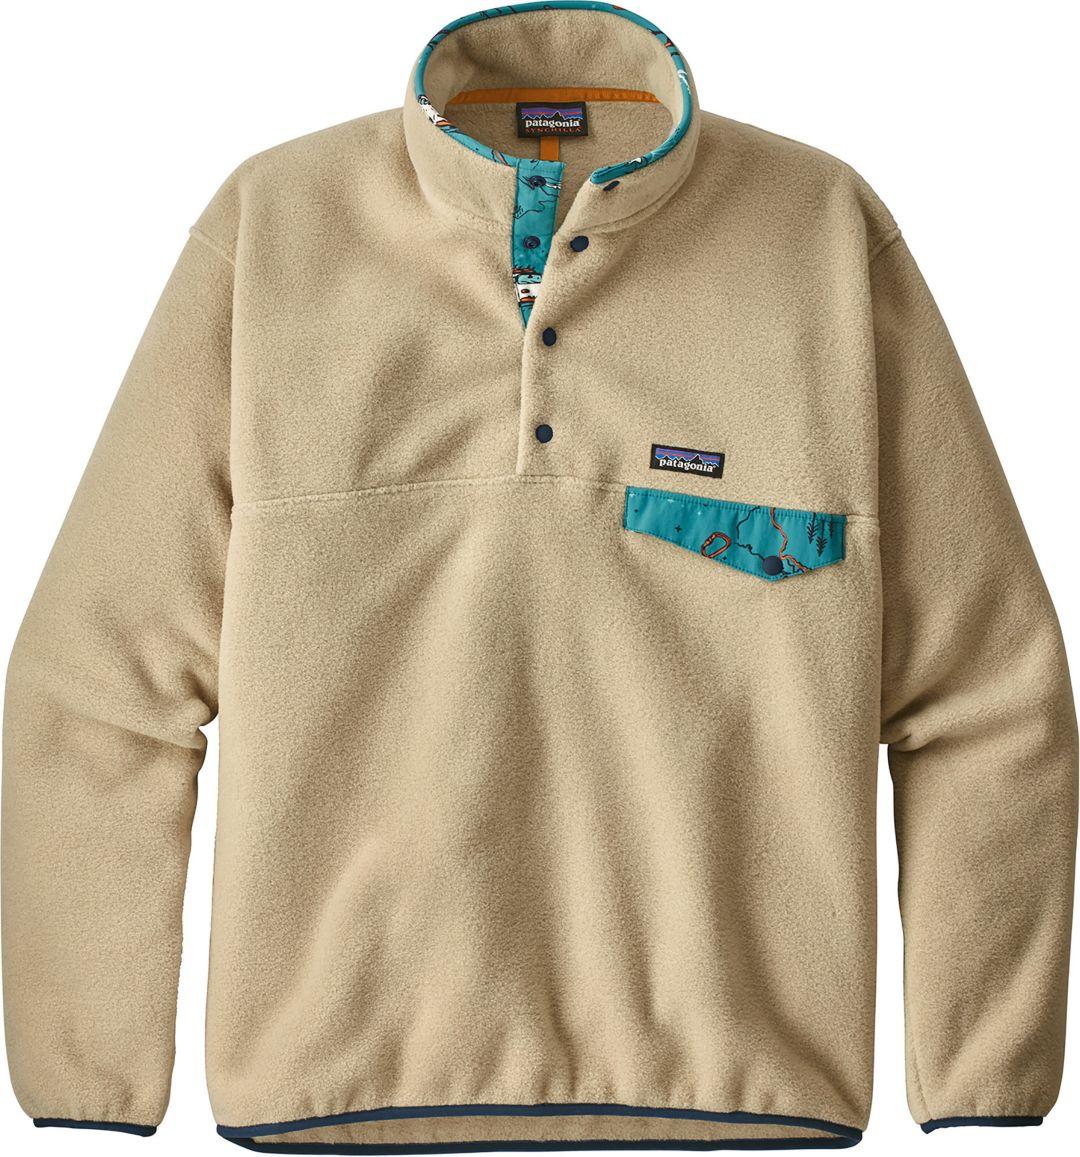 78e0dcfbf99 Patagonia Men's Lightweight Synchilla Snap-T Fleece Pullover